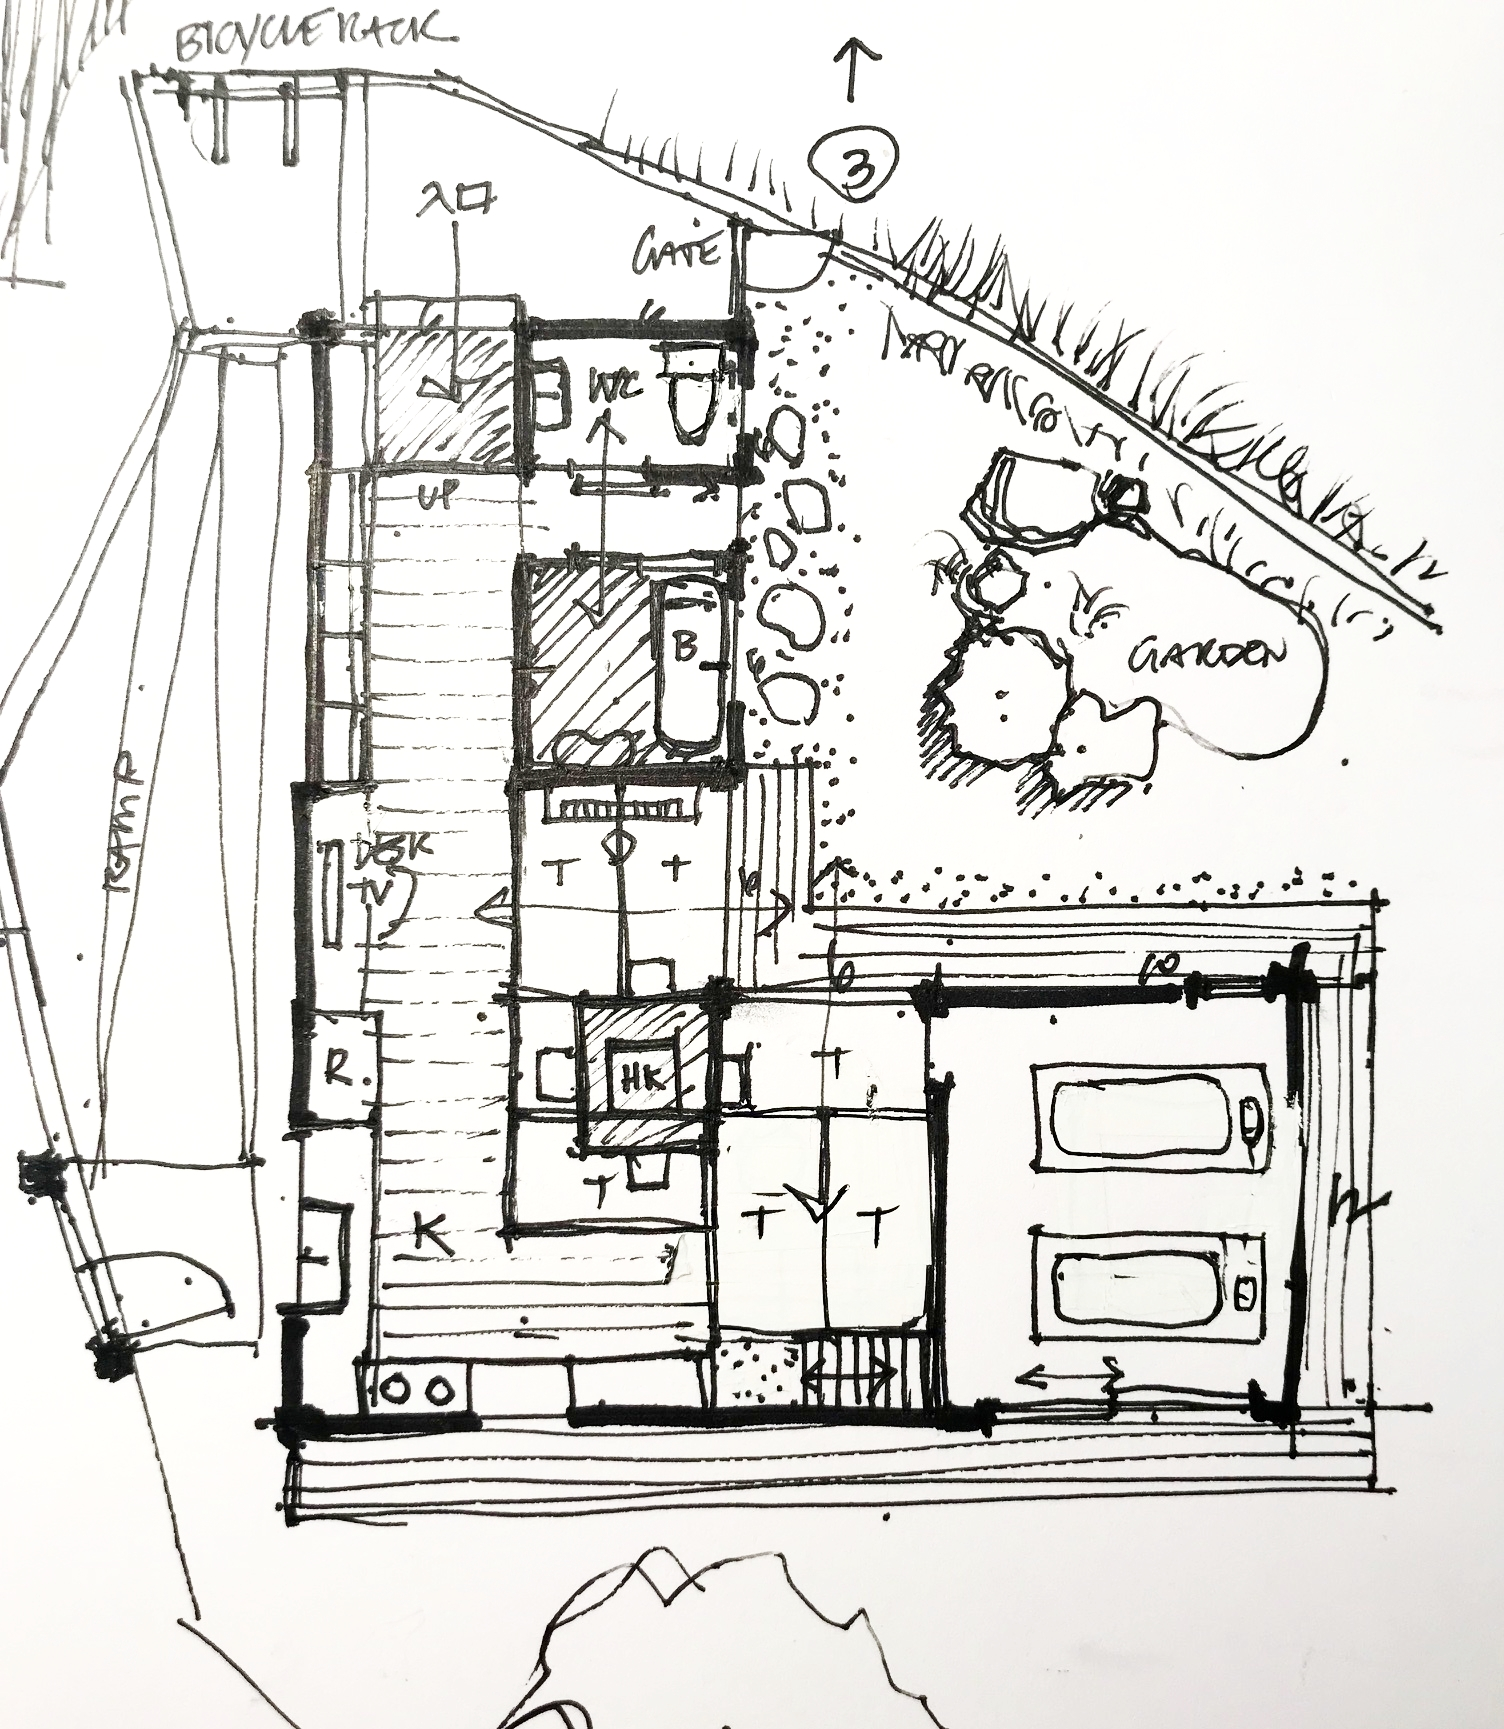 T= tatami HK = horikotatsu (sunken table heater) WC= water closet B = bath R = refrigerator K= kitchen